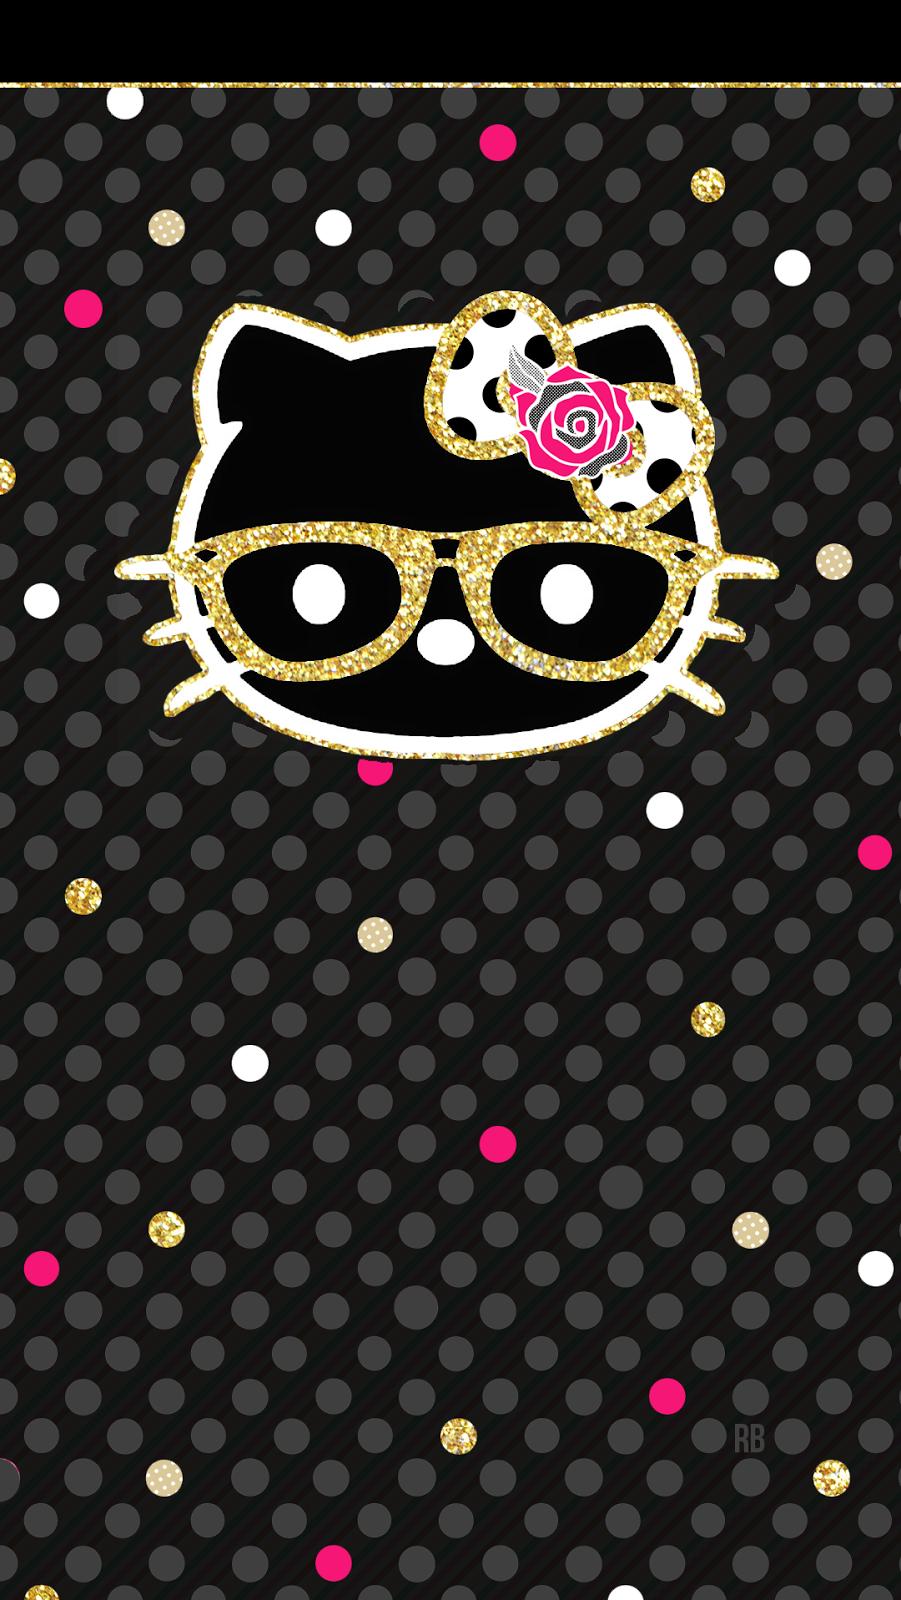 Top Wallpaper Hello Kitty Glitter - fe8d997adab72dc5de6749d37ac546a5  2018_26964.png